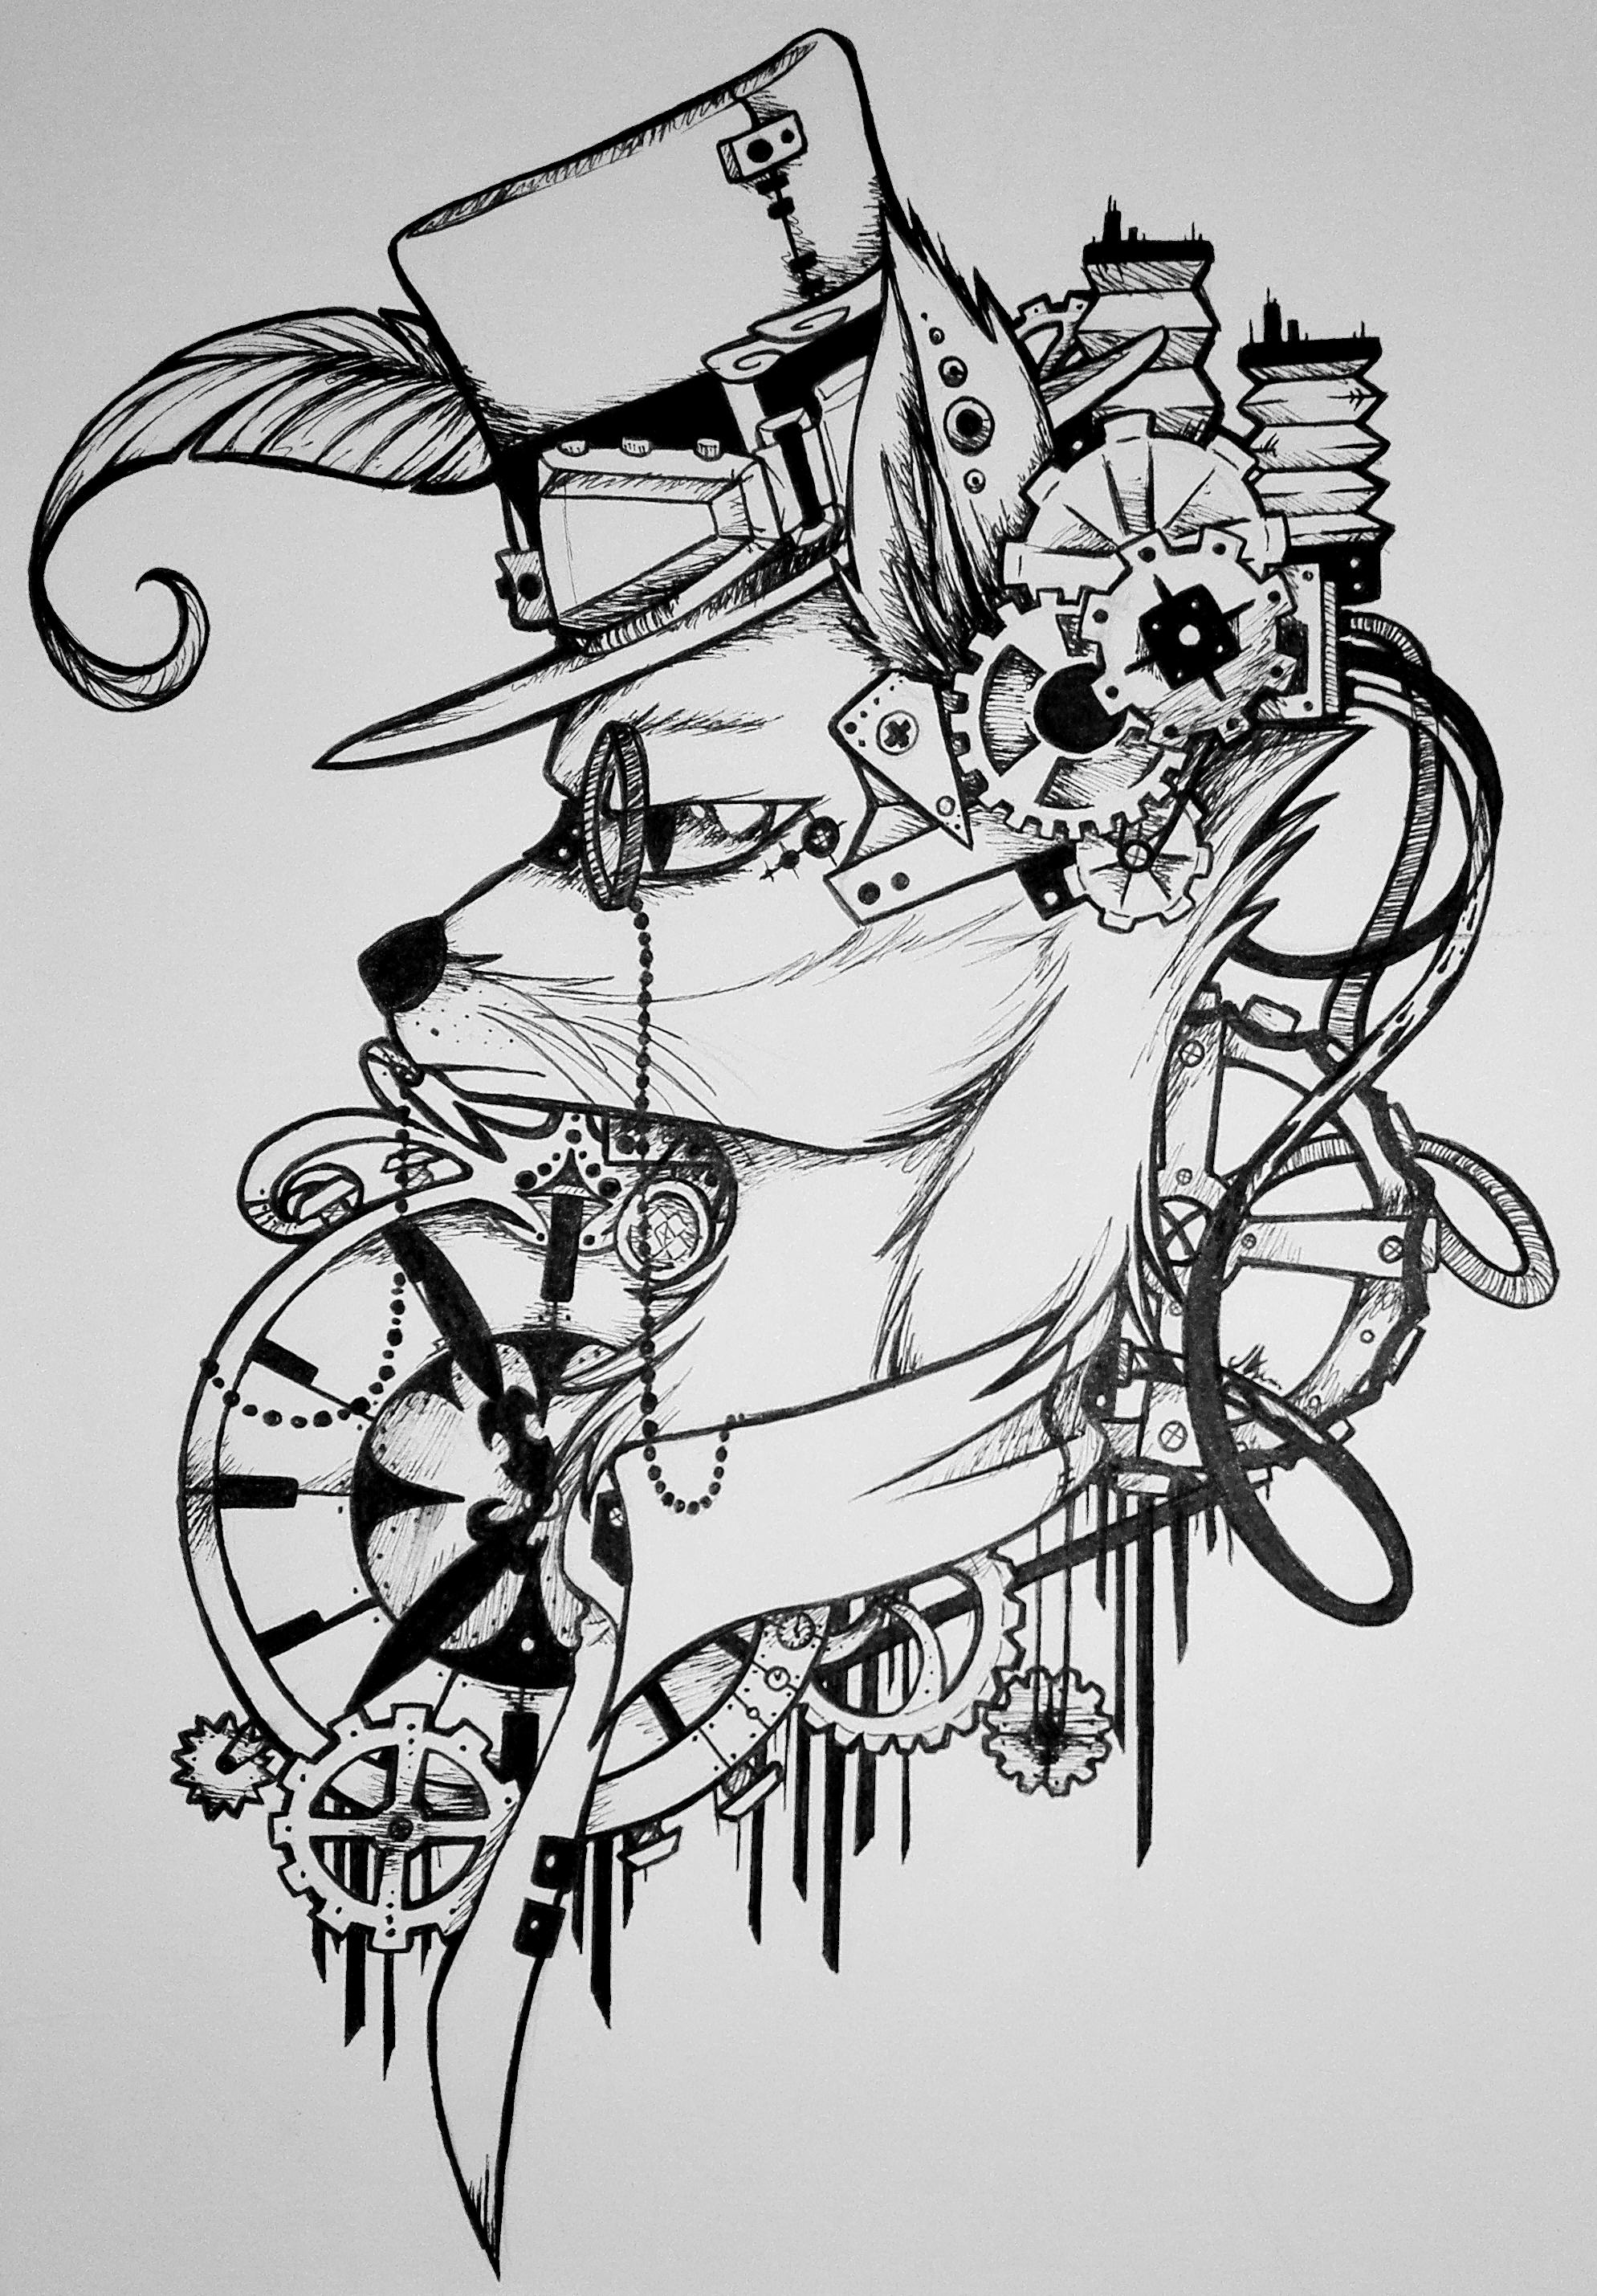 Steampunk Fox by Jadekettu on DeviantArt